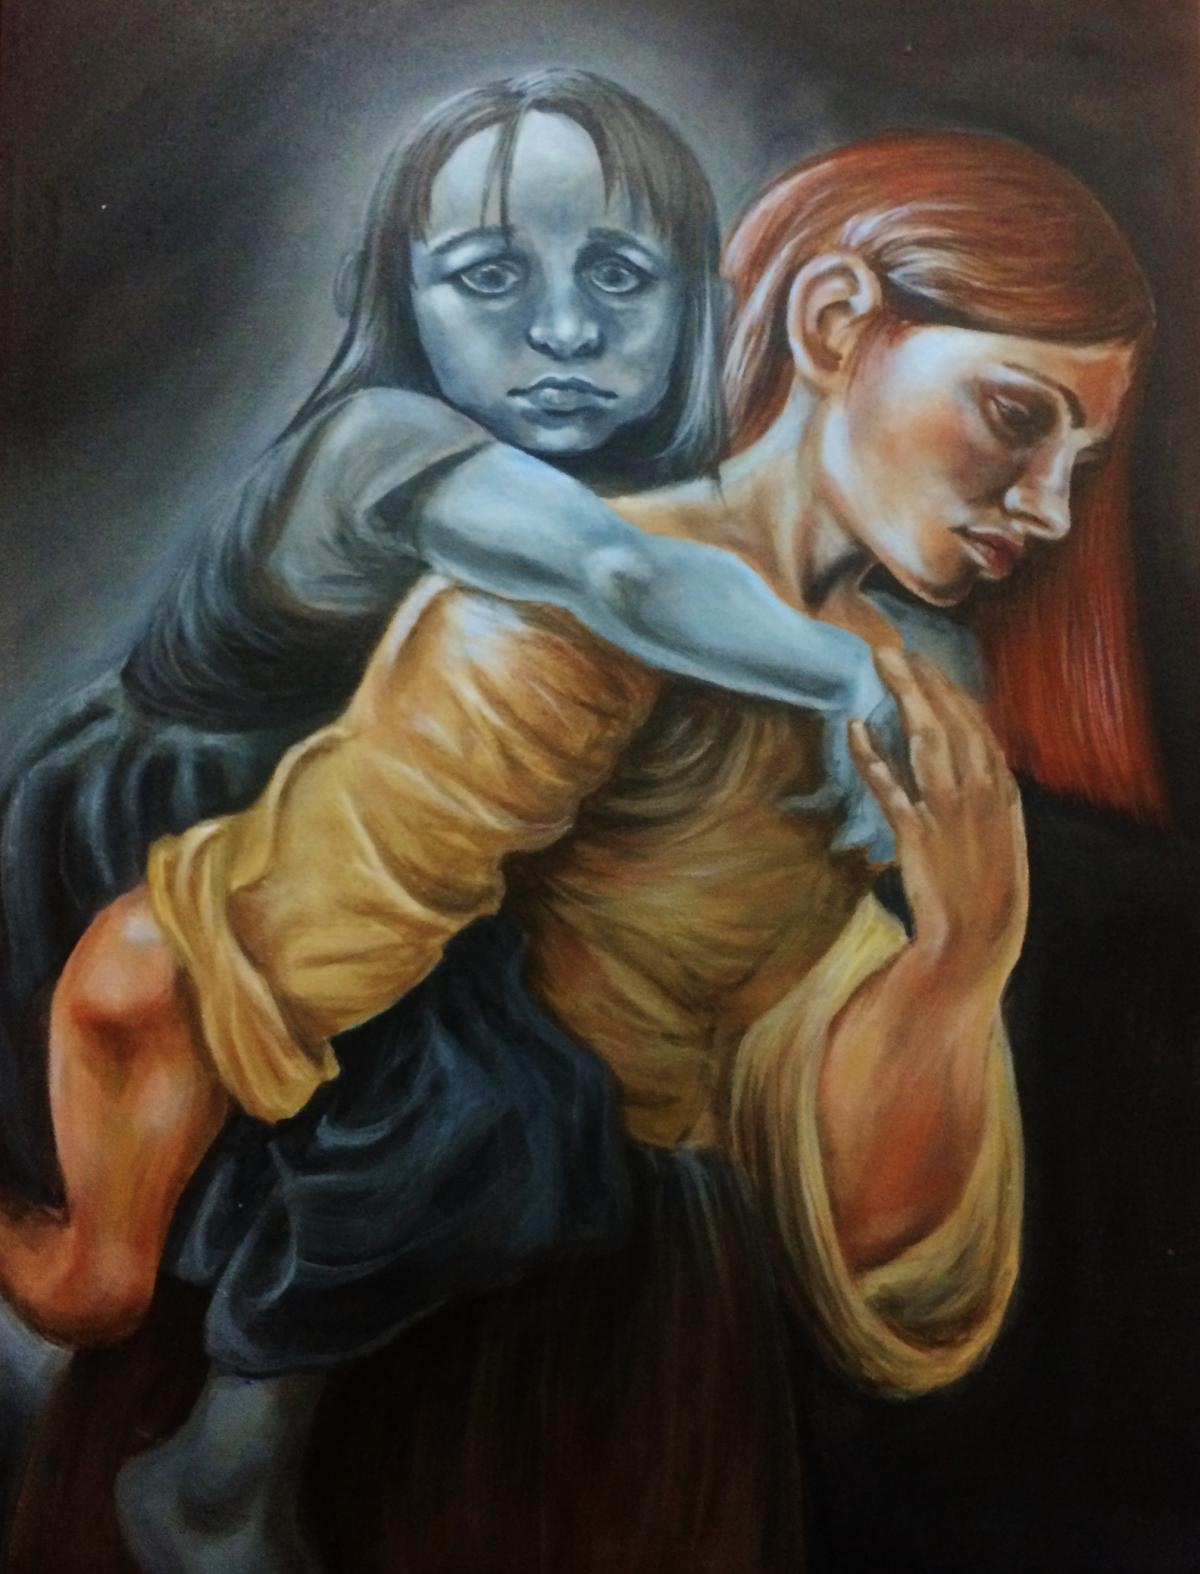 Artwork by Ana Wong (Ryman '18)